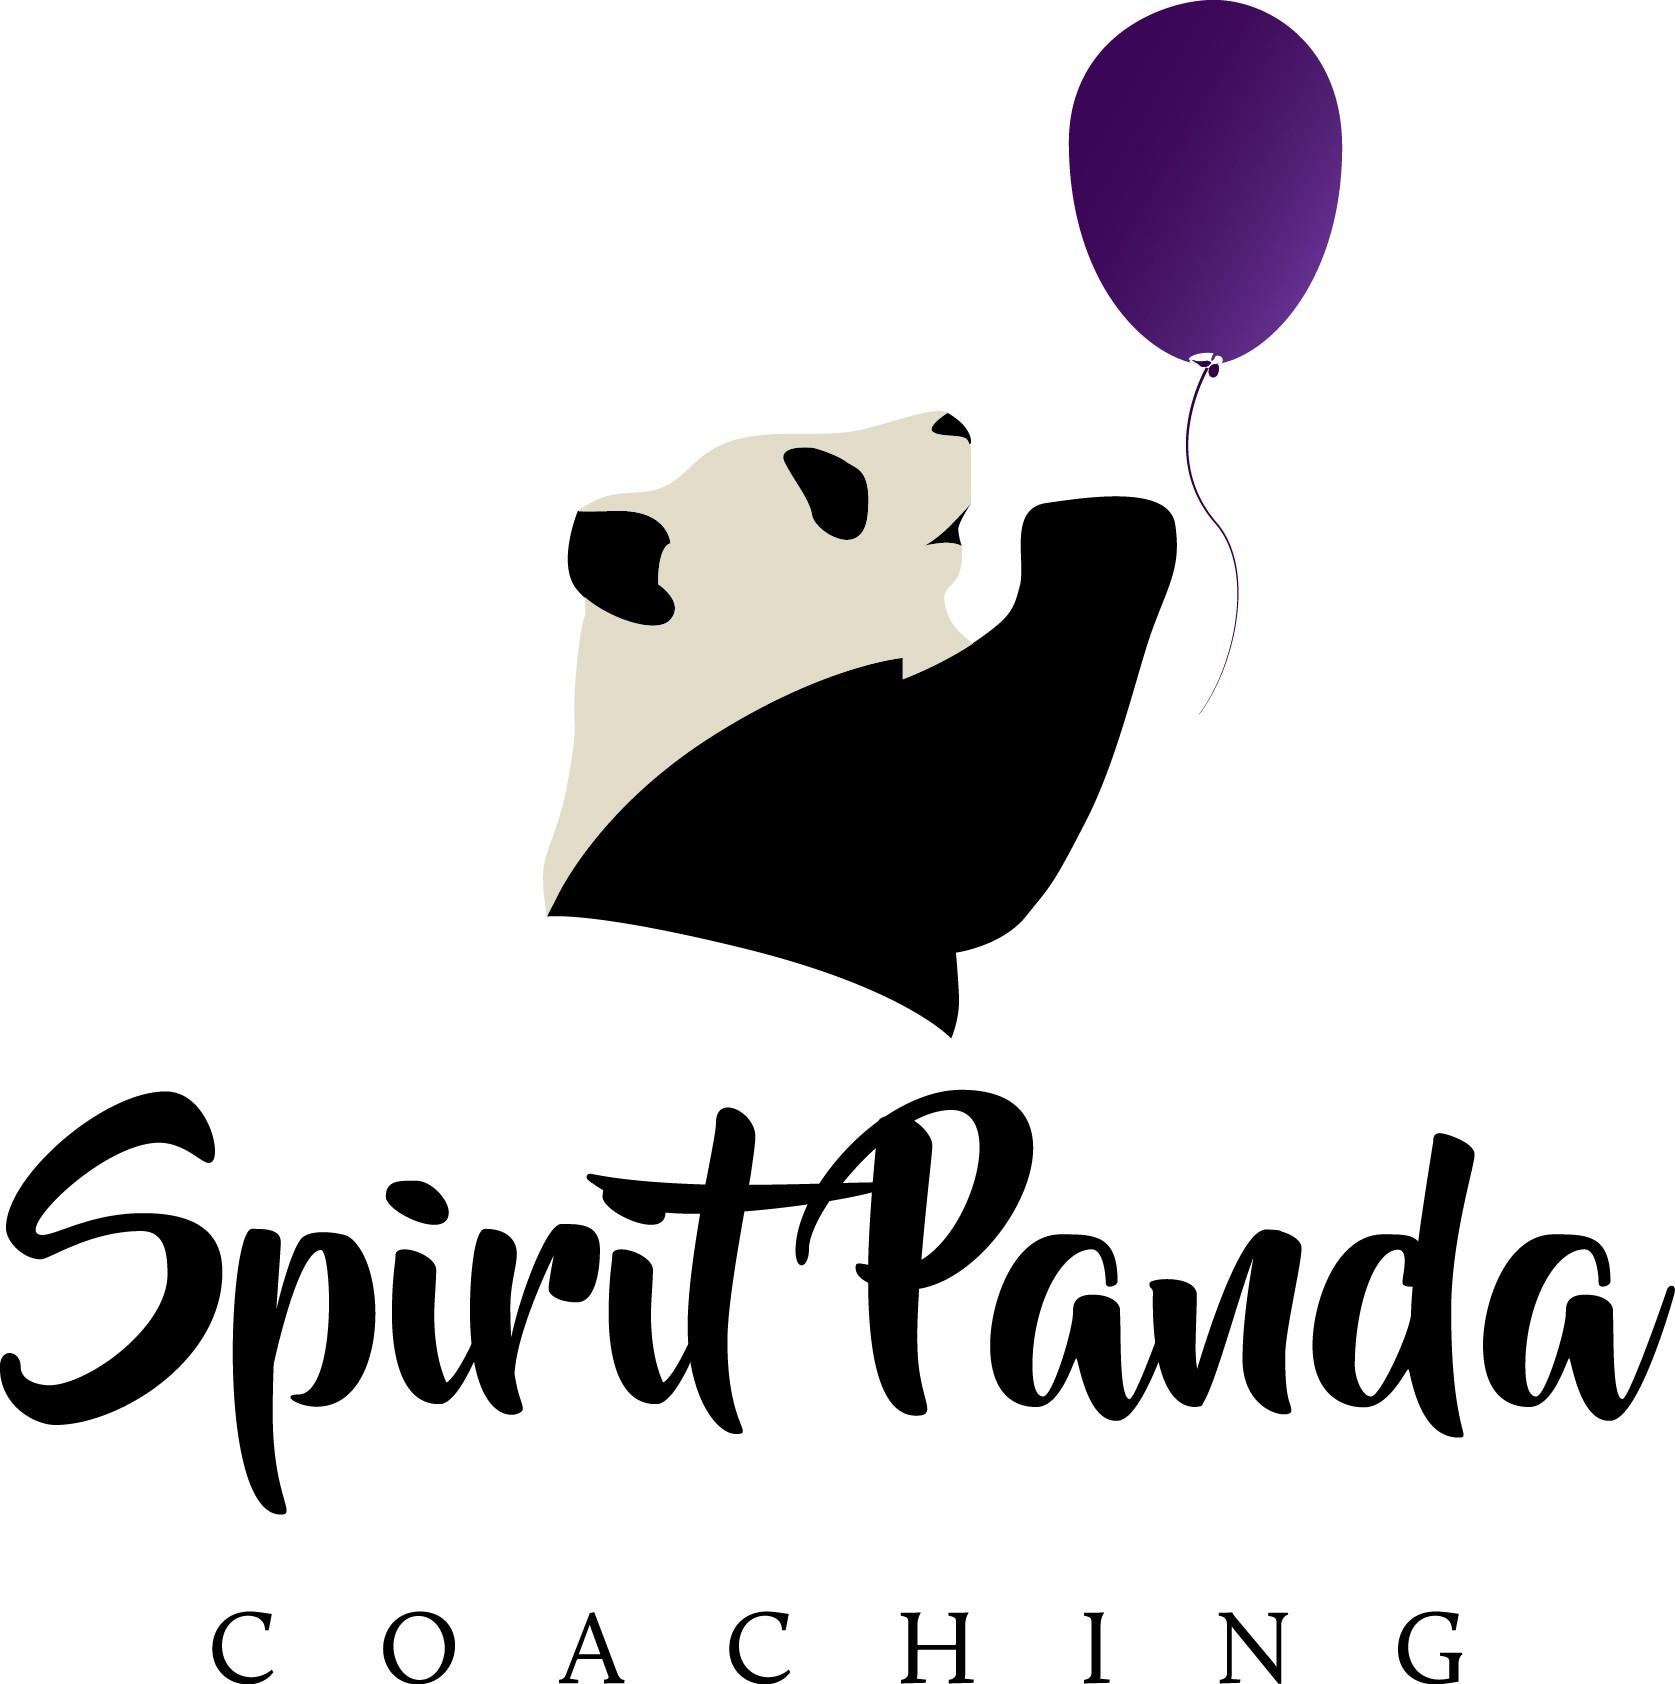 Life Coaching Business needs a powerful spirit panda design logo